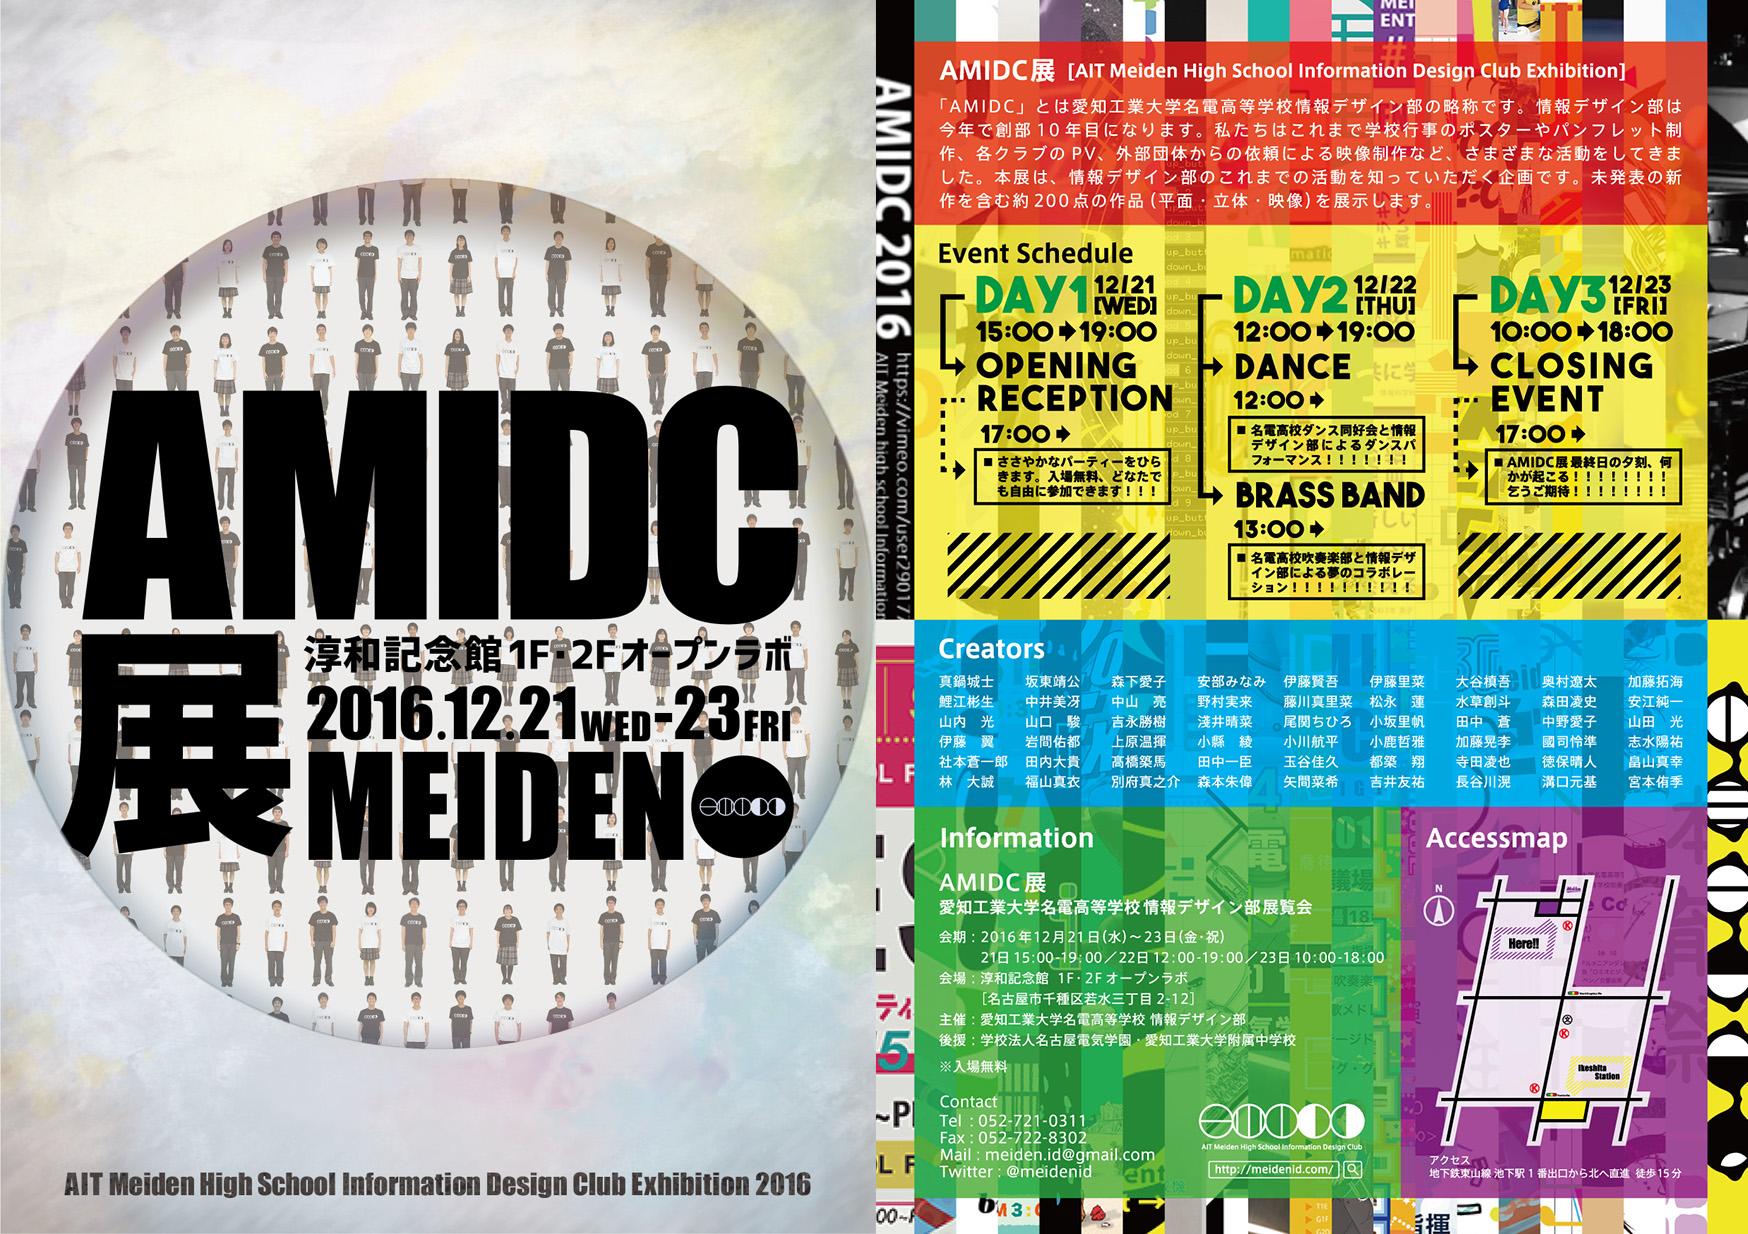 AMIDC展